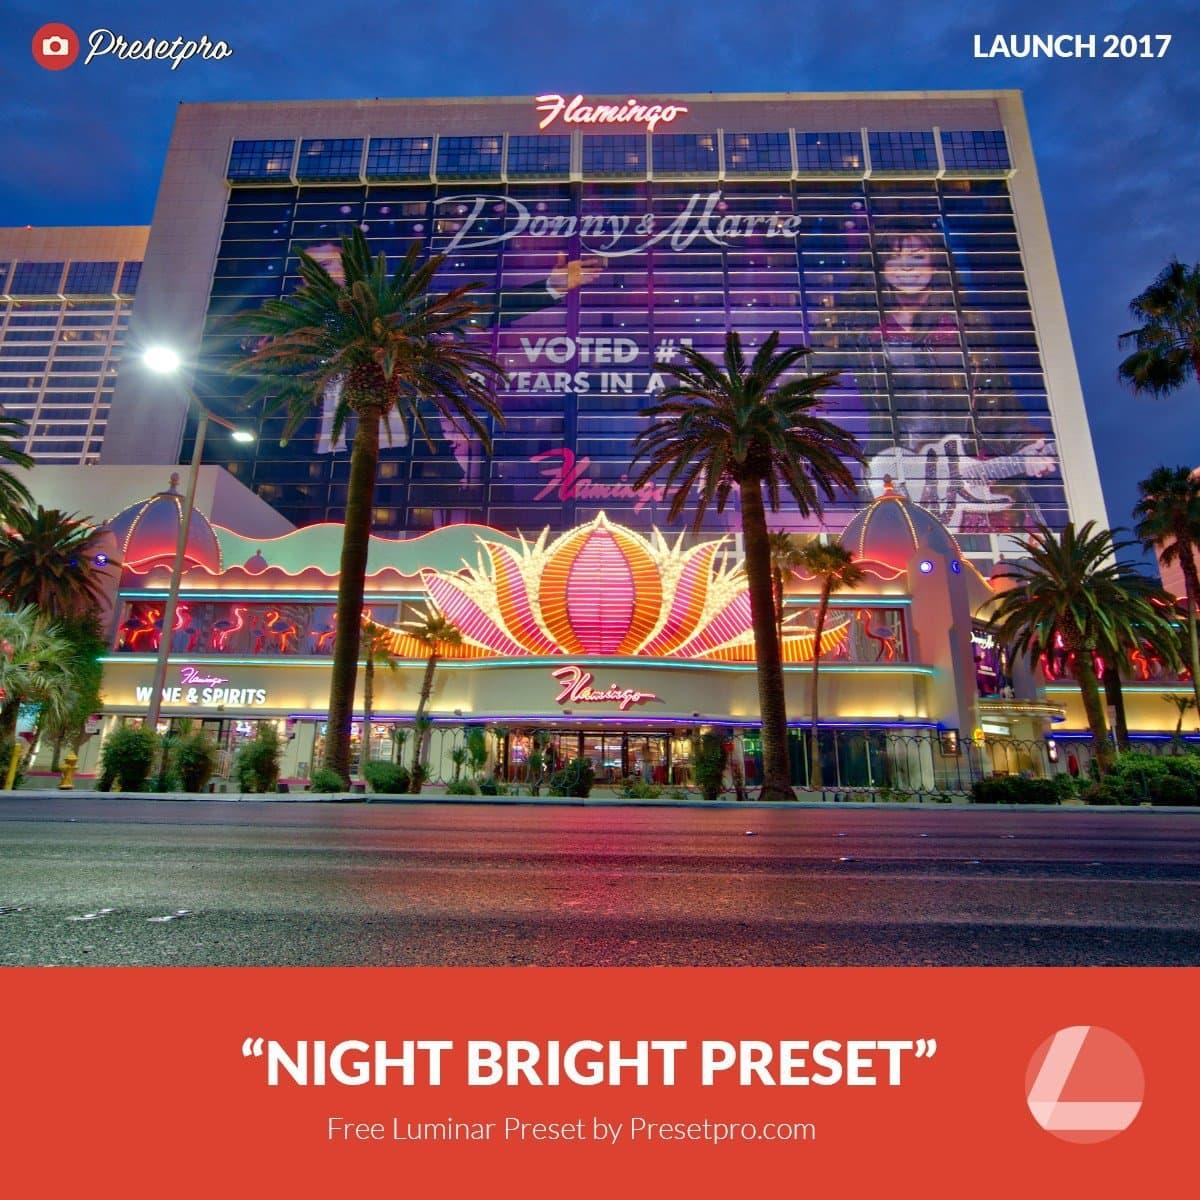 Free-Luminar-Preset-Night-Bright